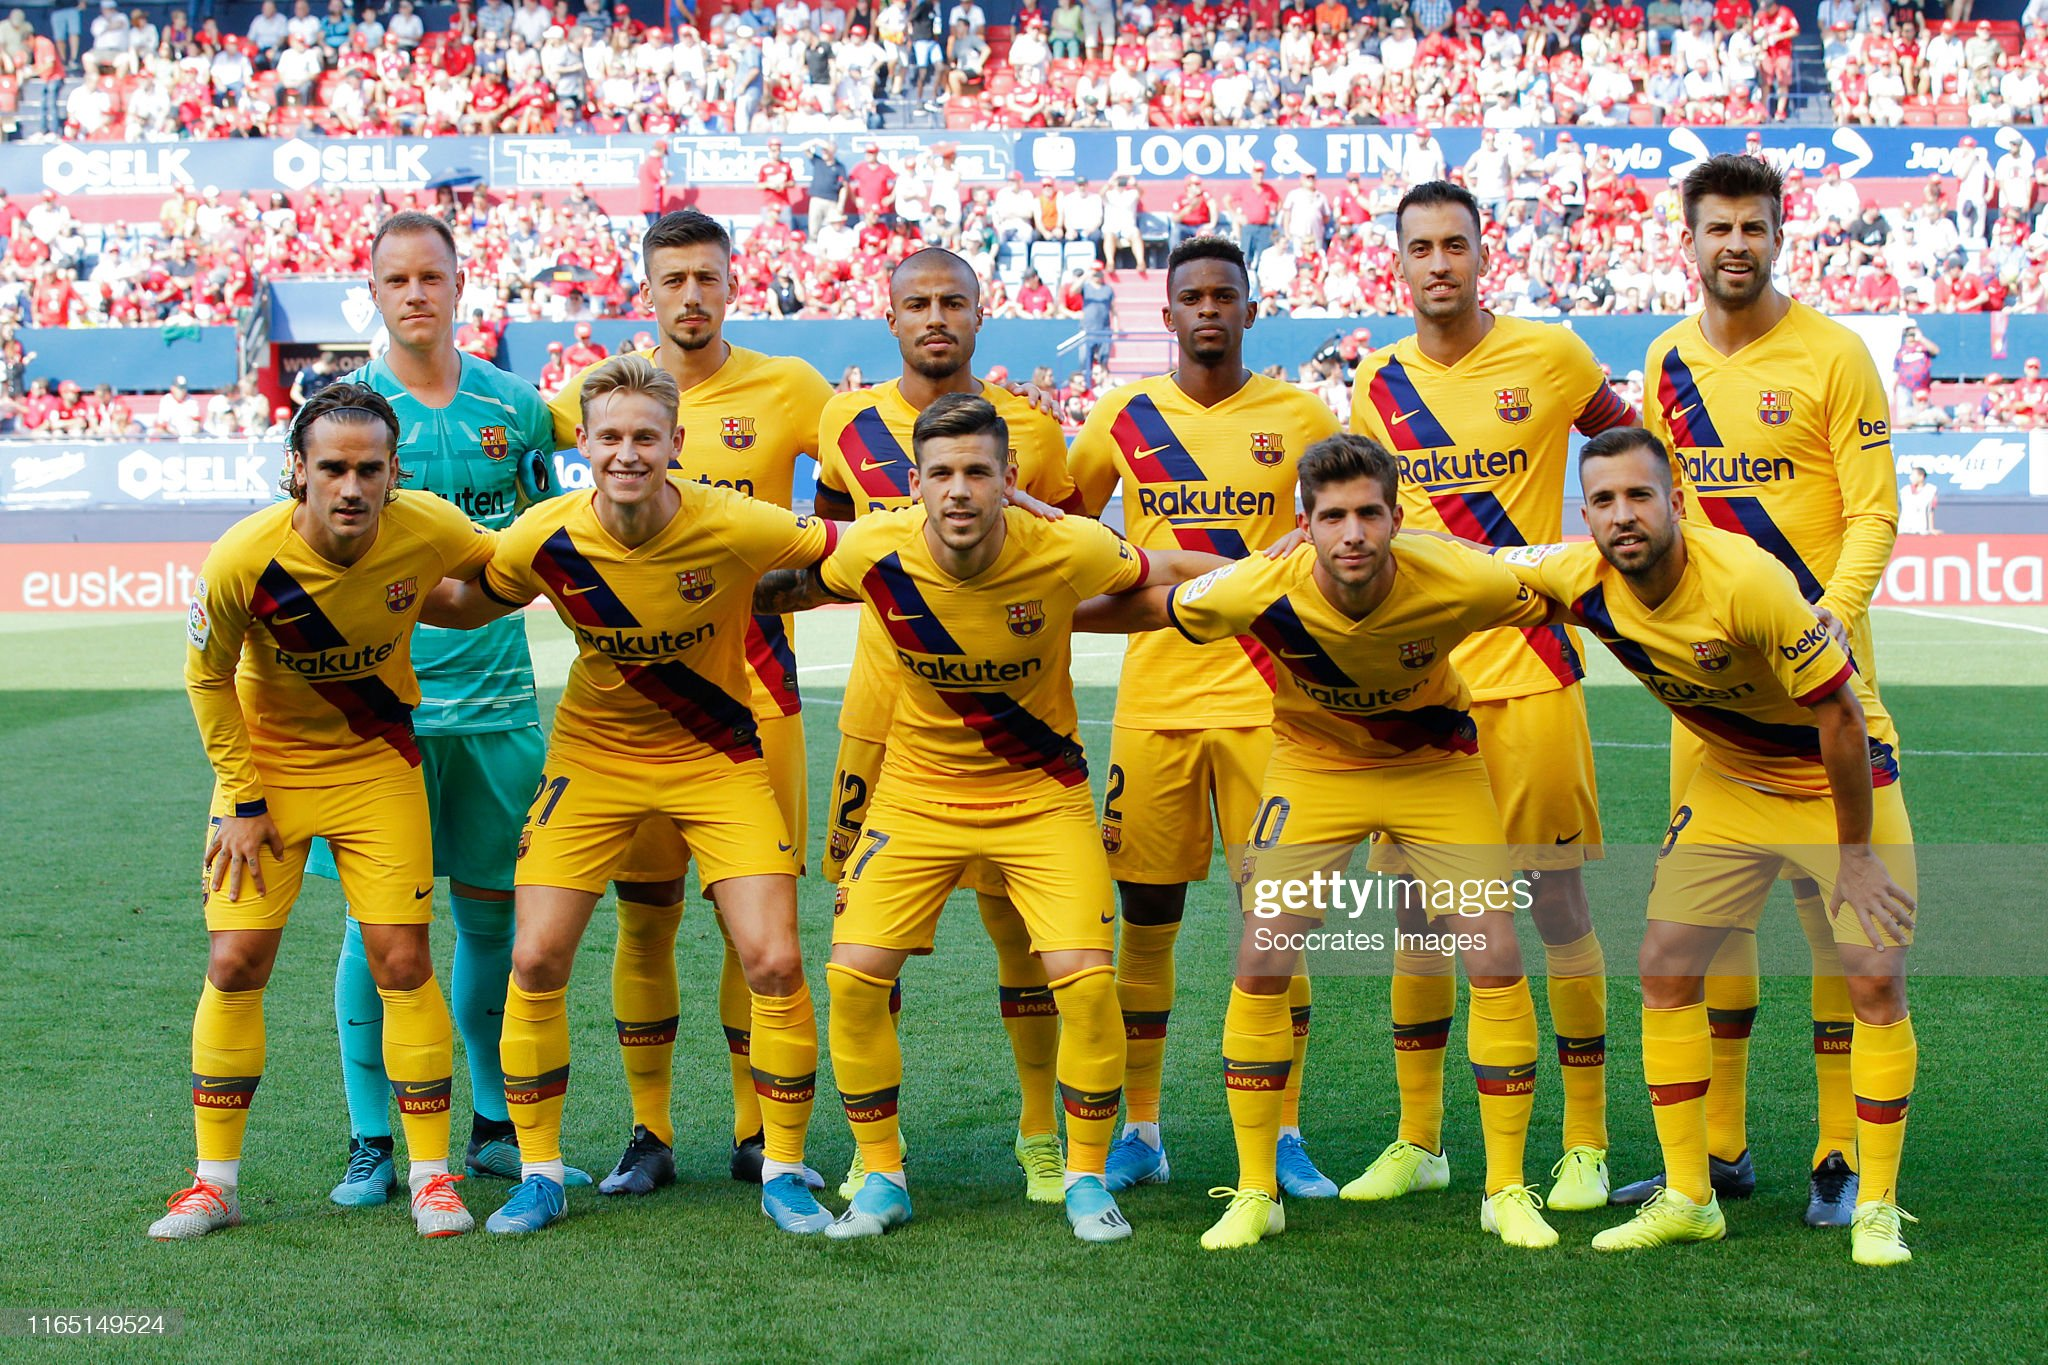 صور مباراة : أوساسونا - برشلونة 2-2 ( 31-08-2019 )  Teamphoto-of-fc-barcelona-during-the-la-liga-santander-match-between-picture-id1165149524?s=2048x2048